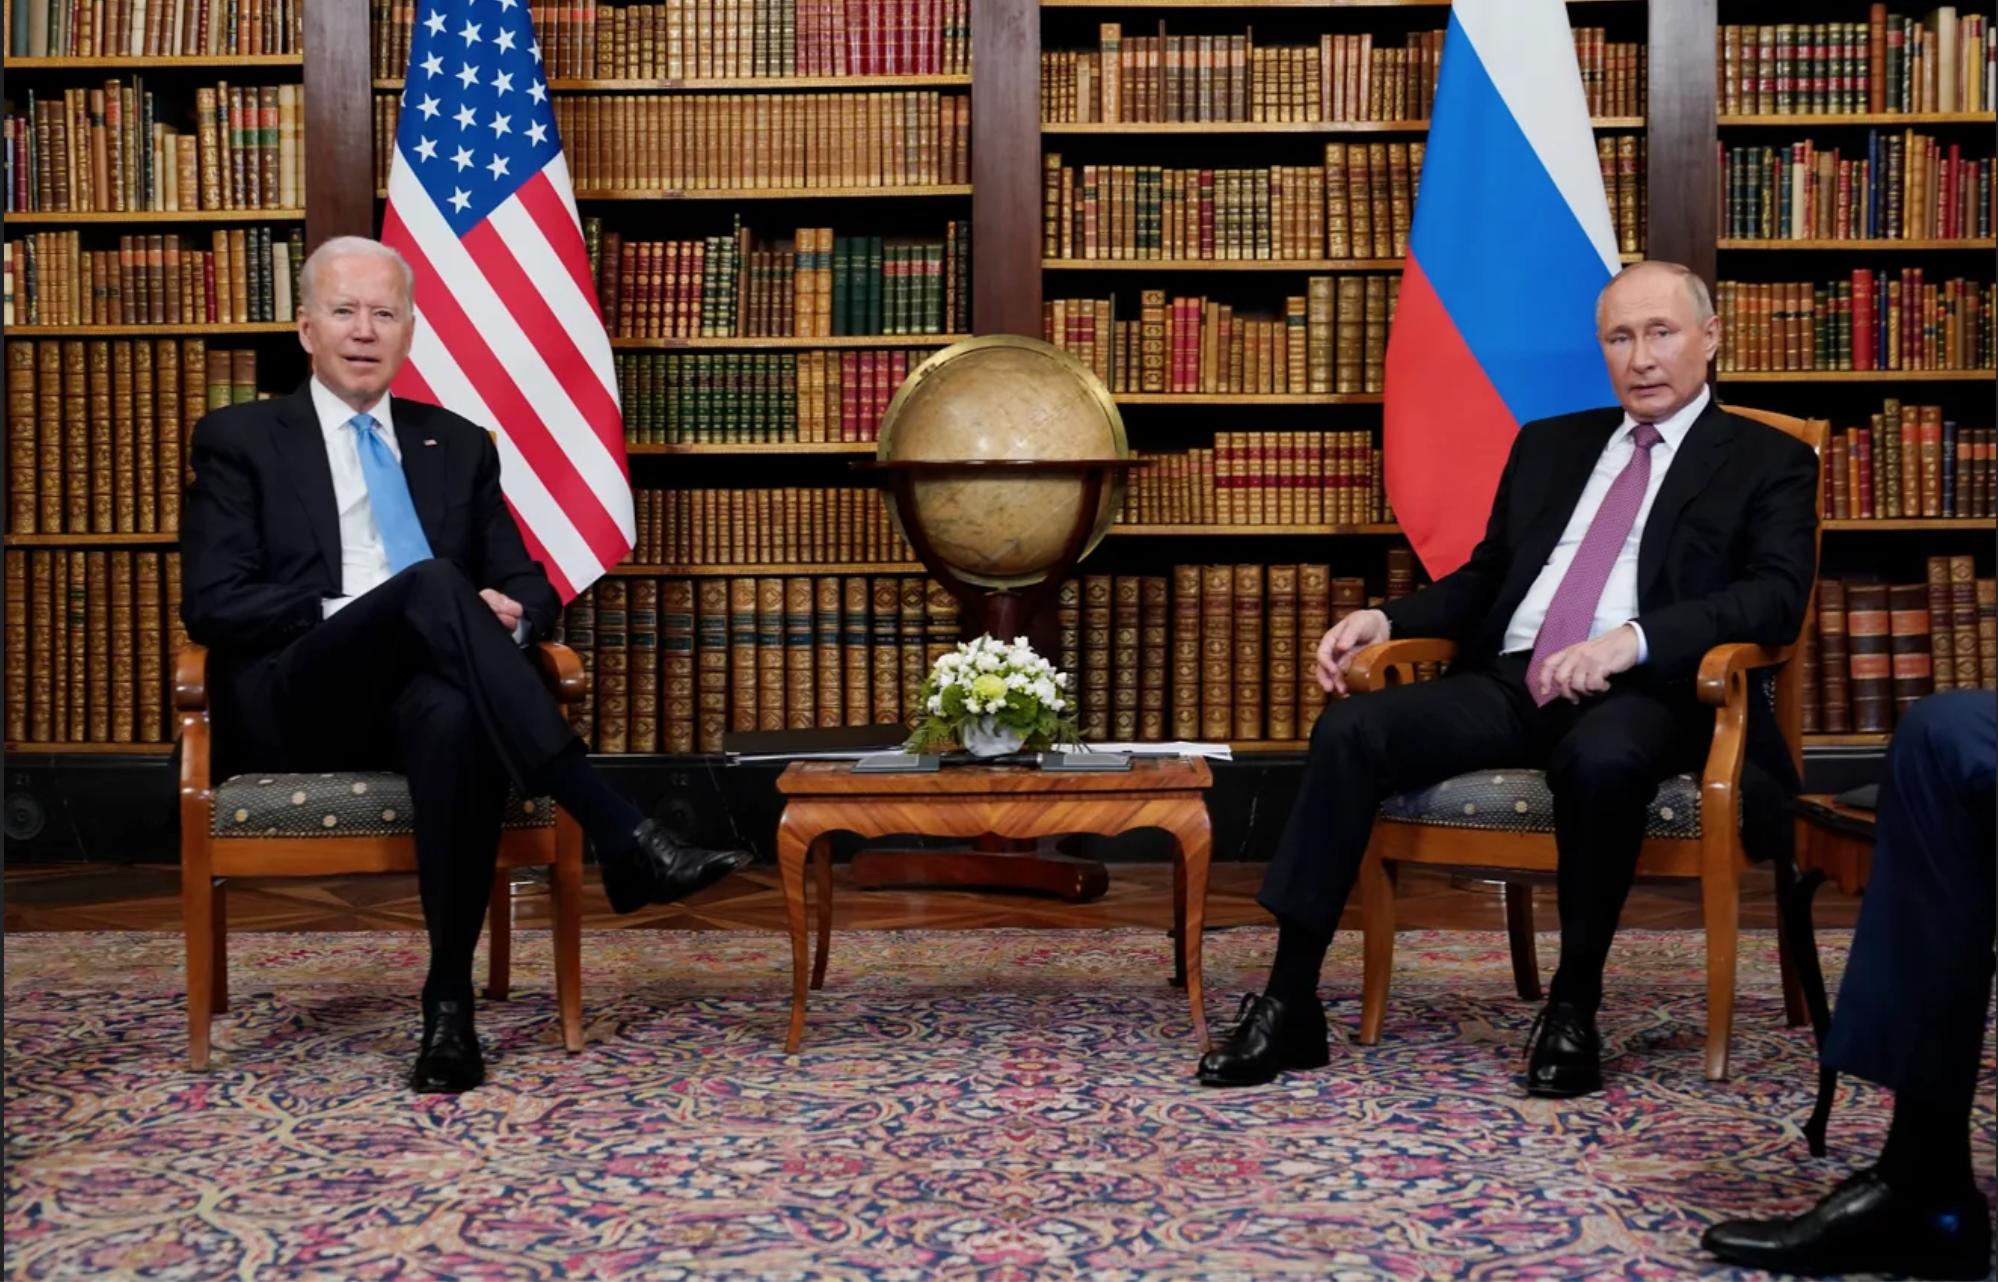 Biden, Putin meet amid US-Russia tensions